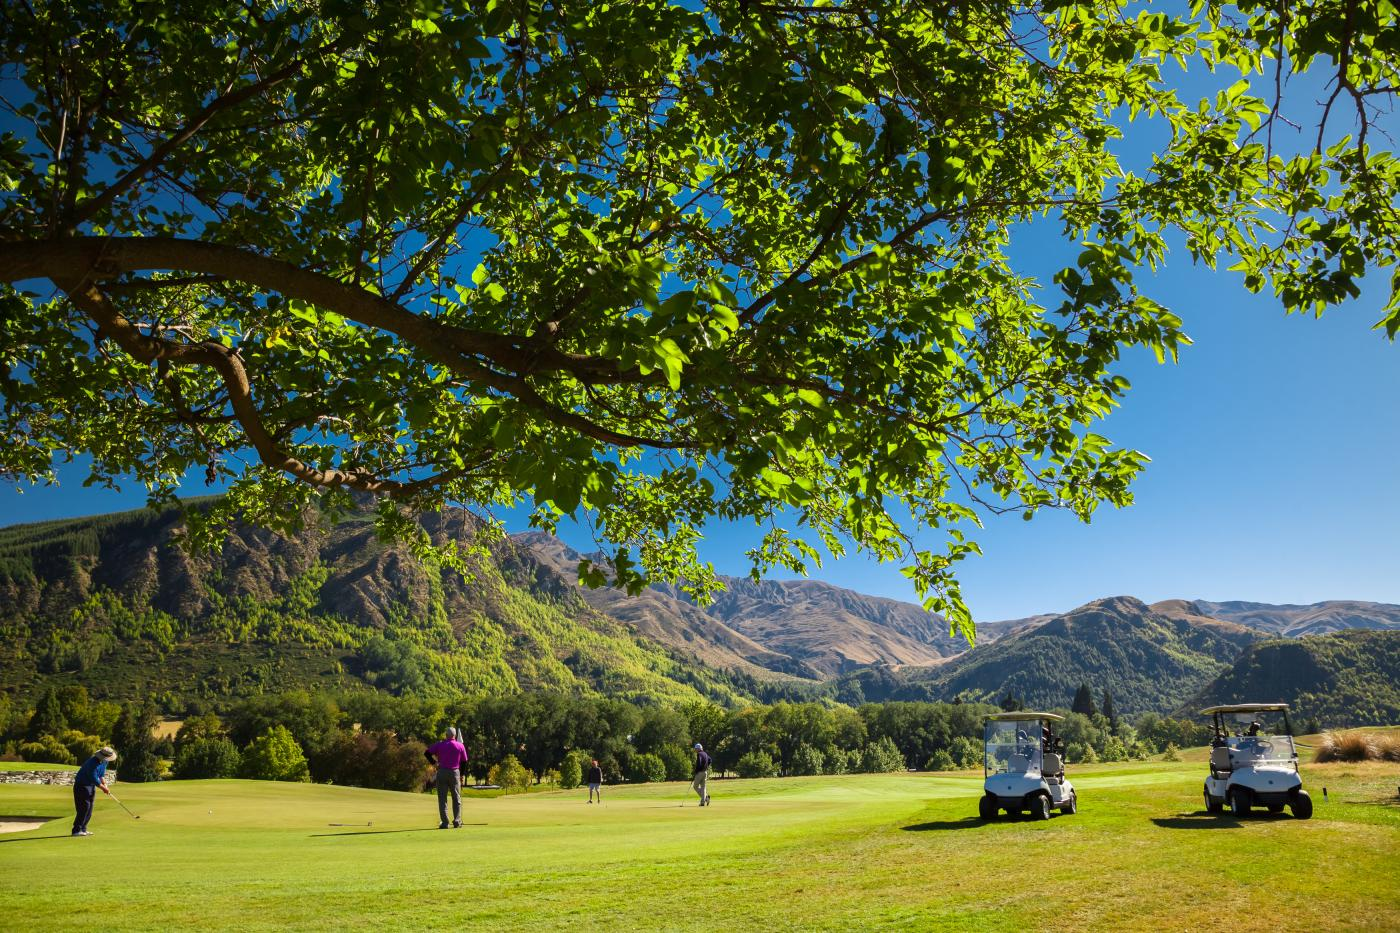 Golf at Millbrook in Spring